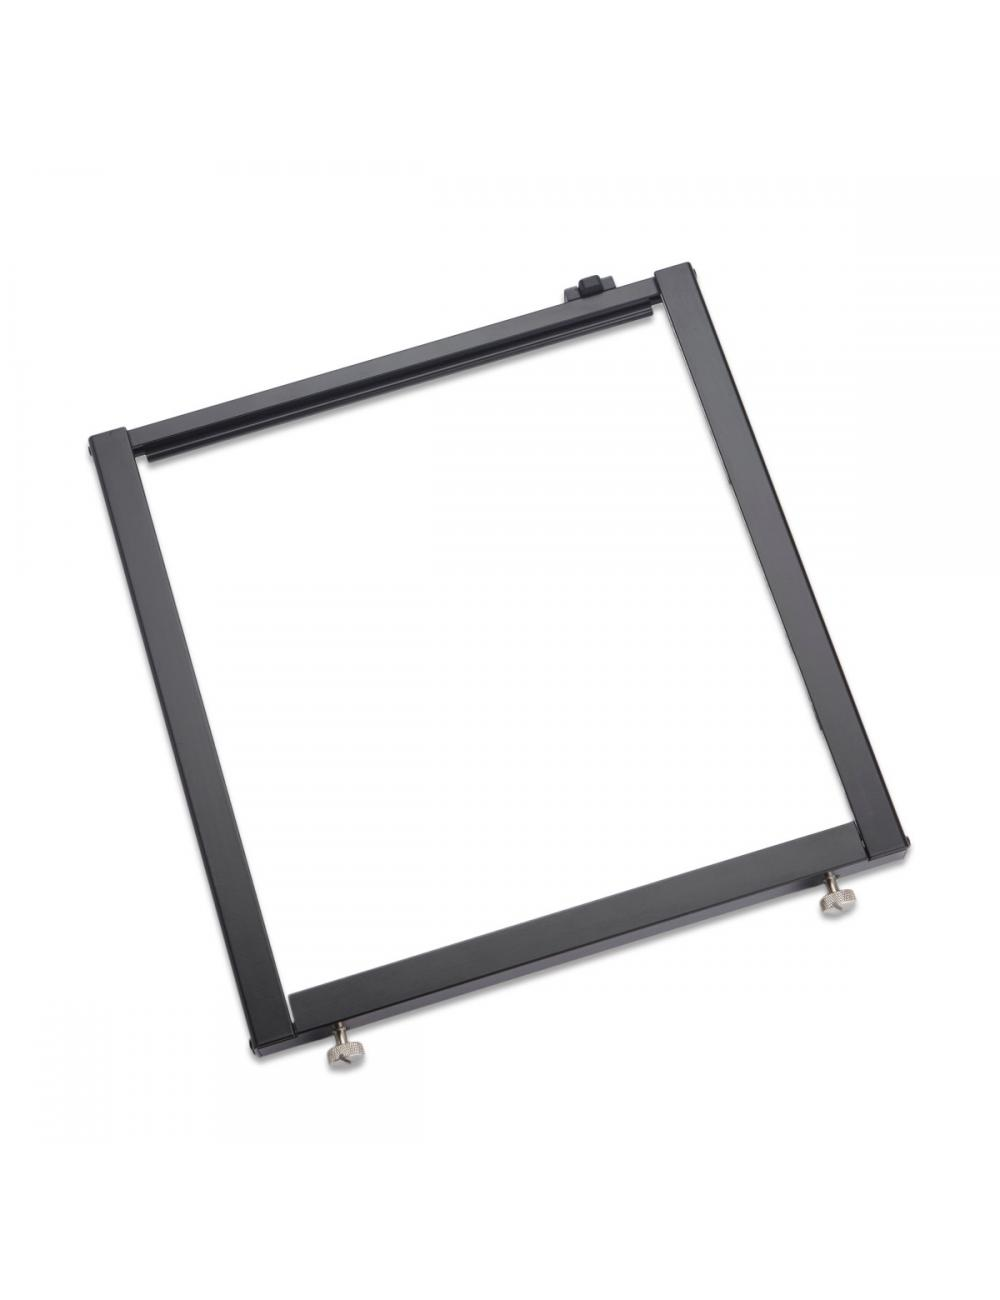 Litepanels Astra Adapter Frame